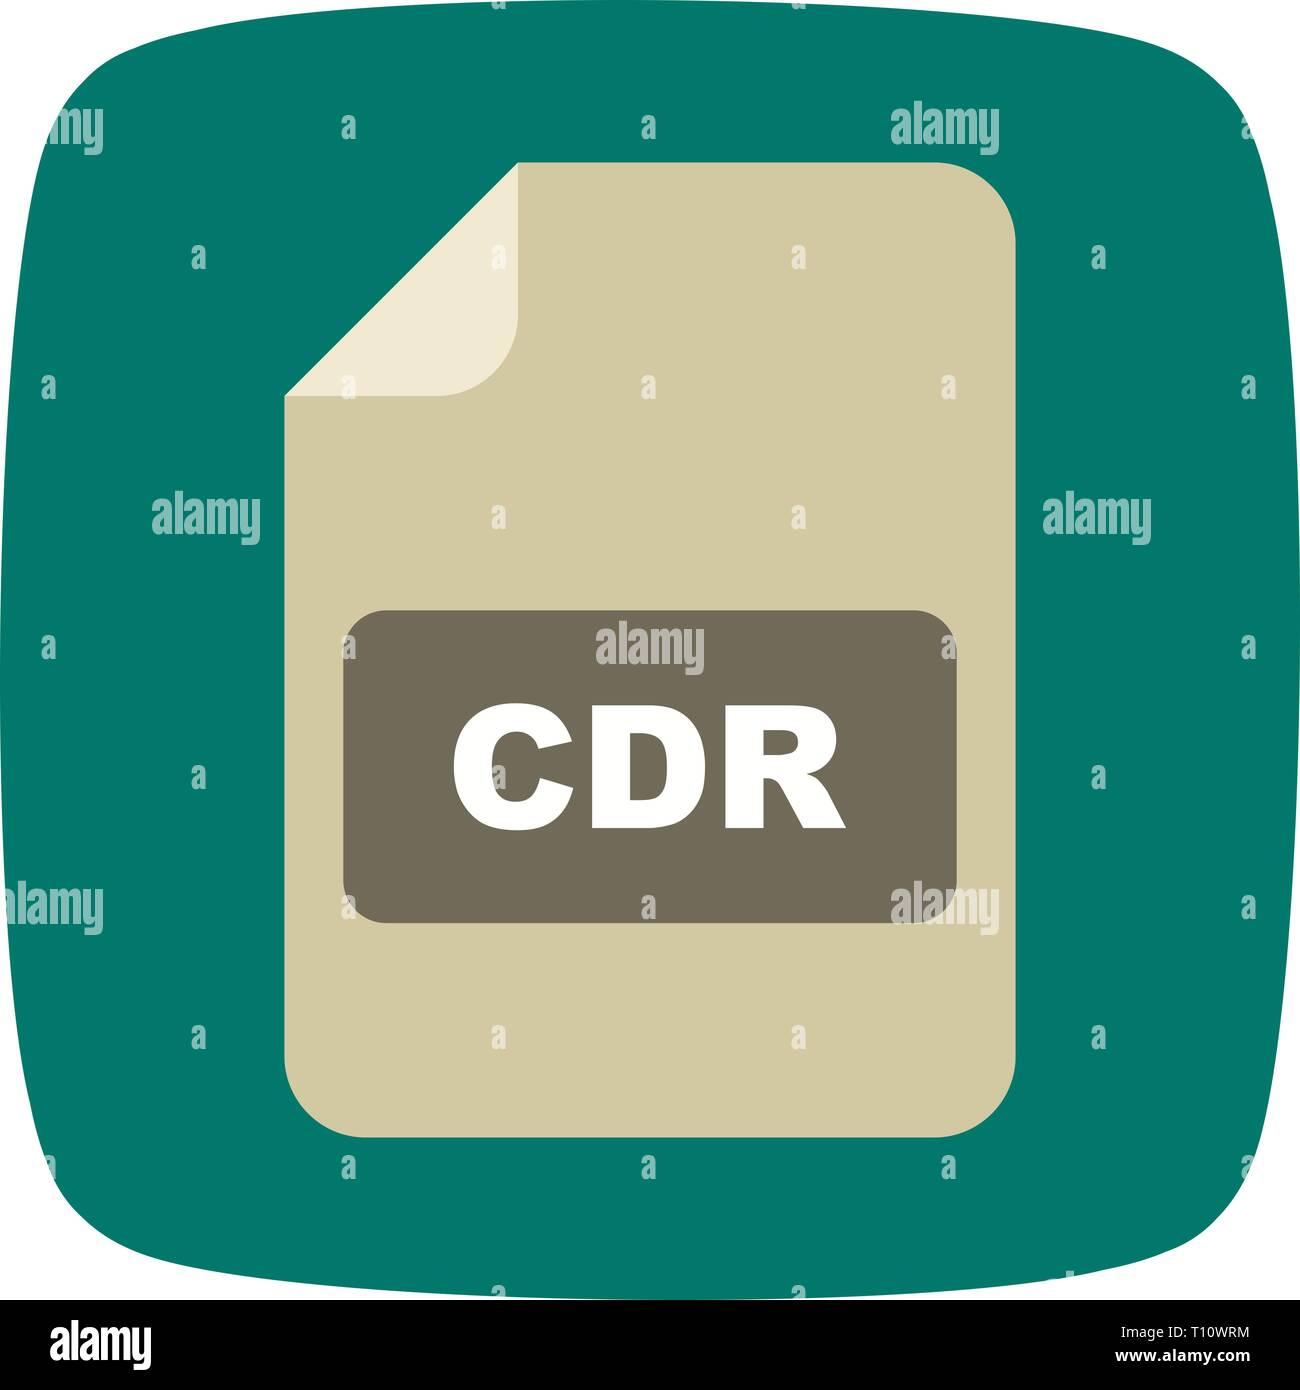 Illustration CDR  Icon - Stock Image